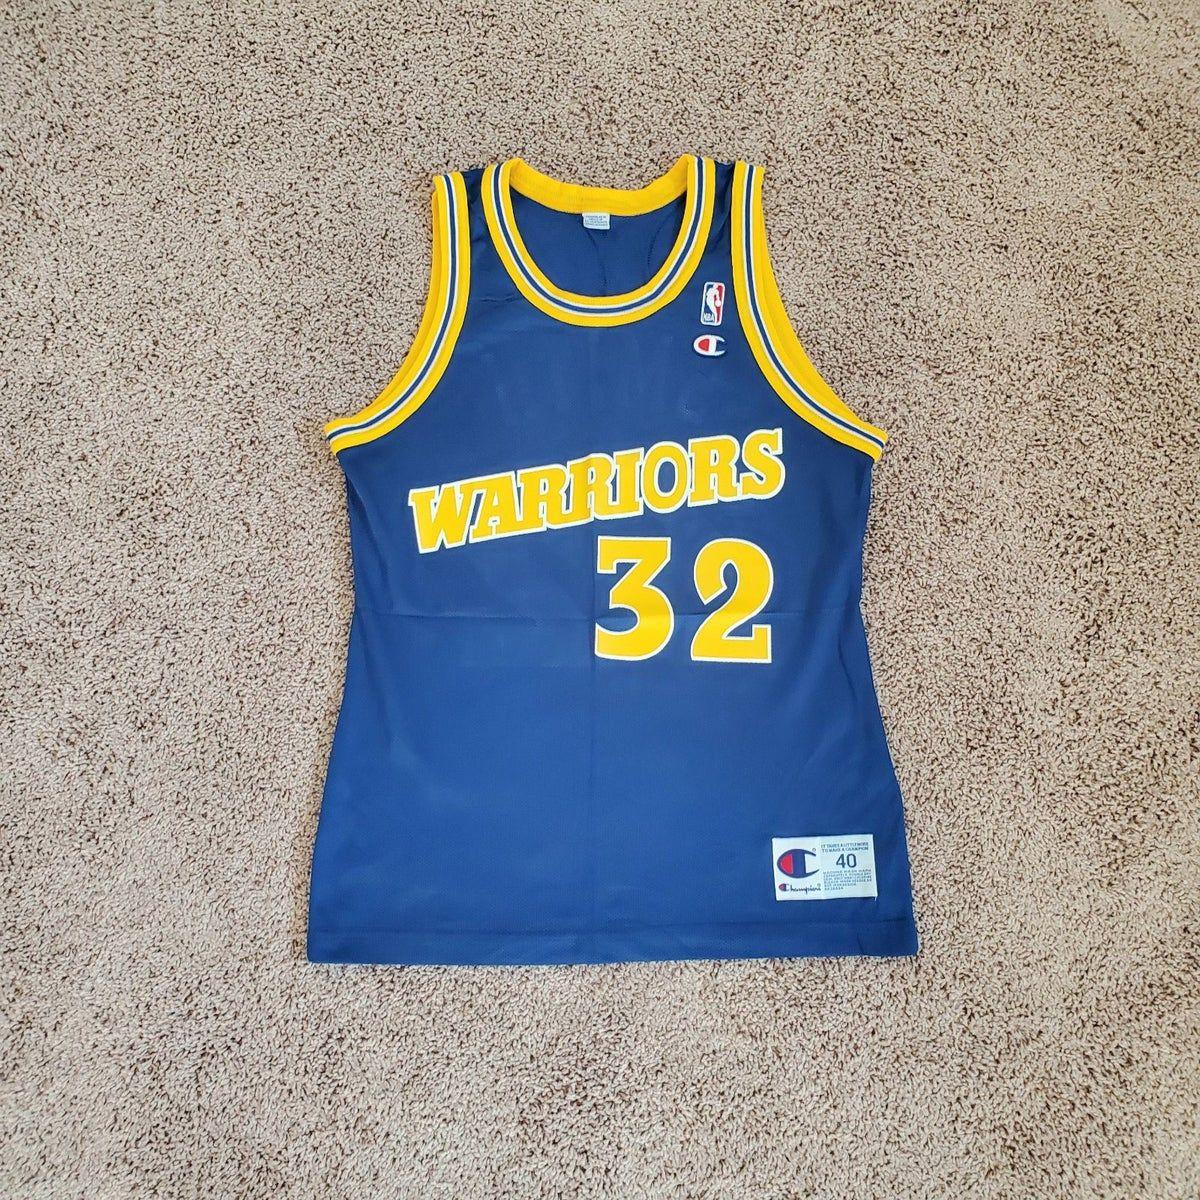 Vintage Golden State Warriors Jersey In 2020 Warrior Golden State Warriors Kobe Bryant Los Angeles